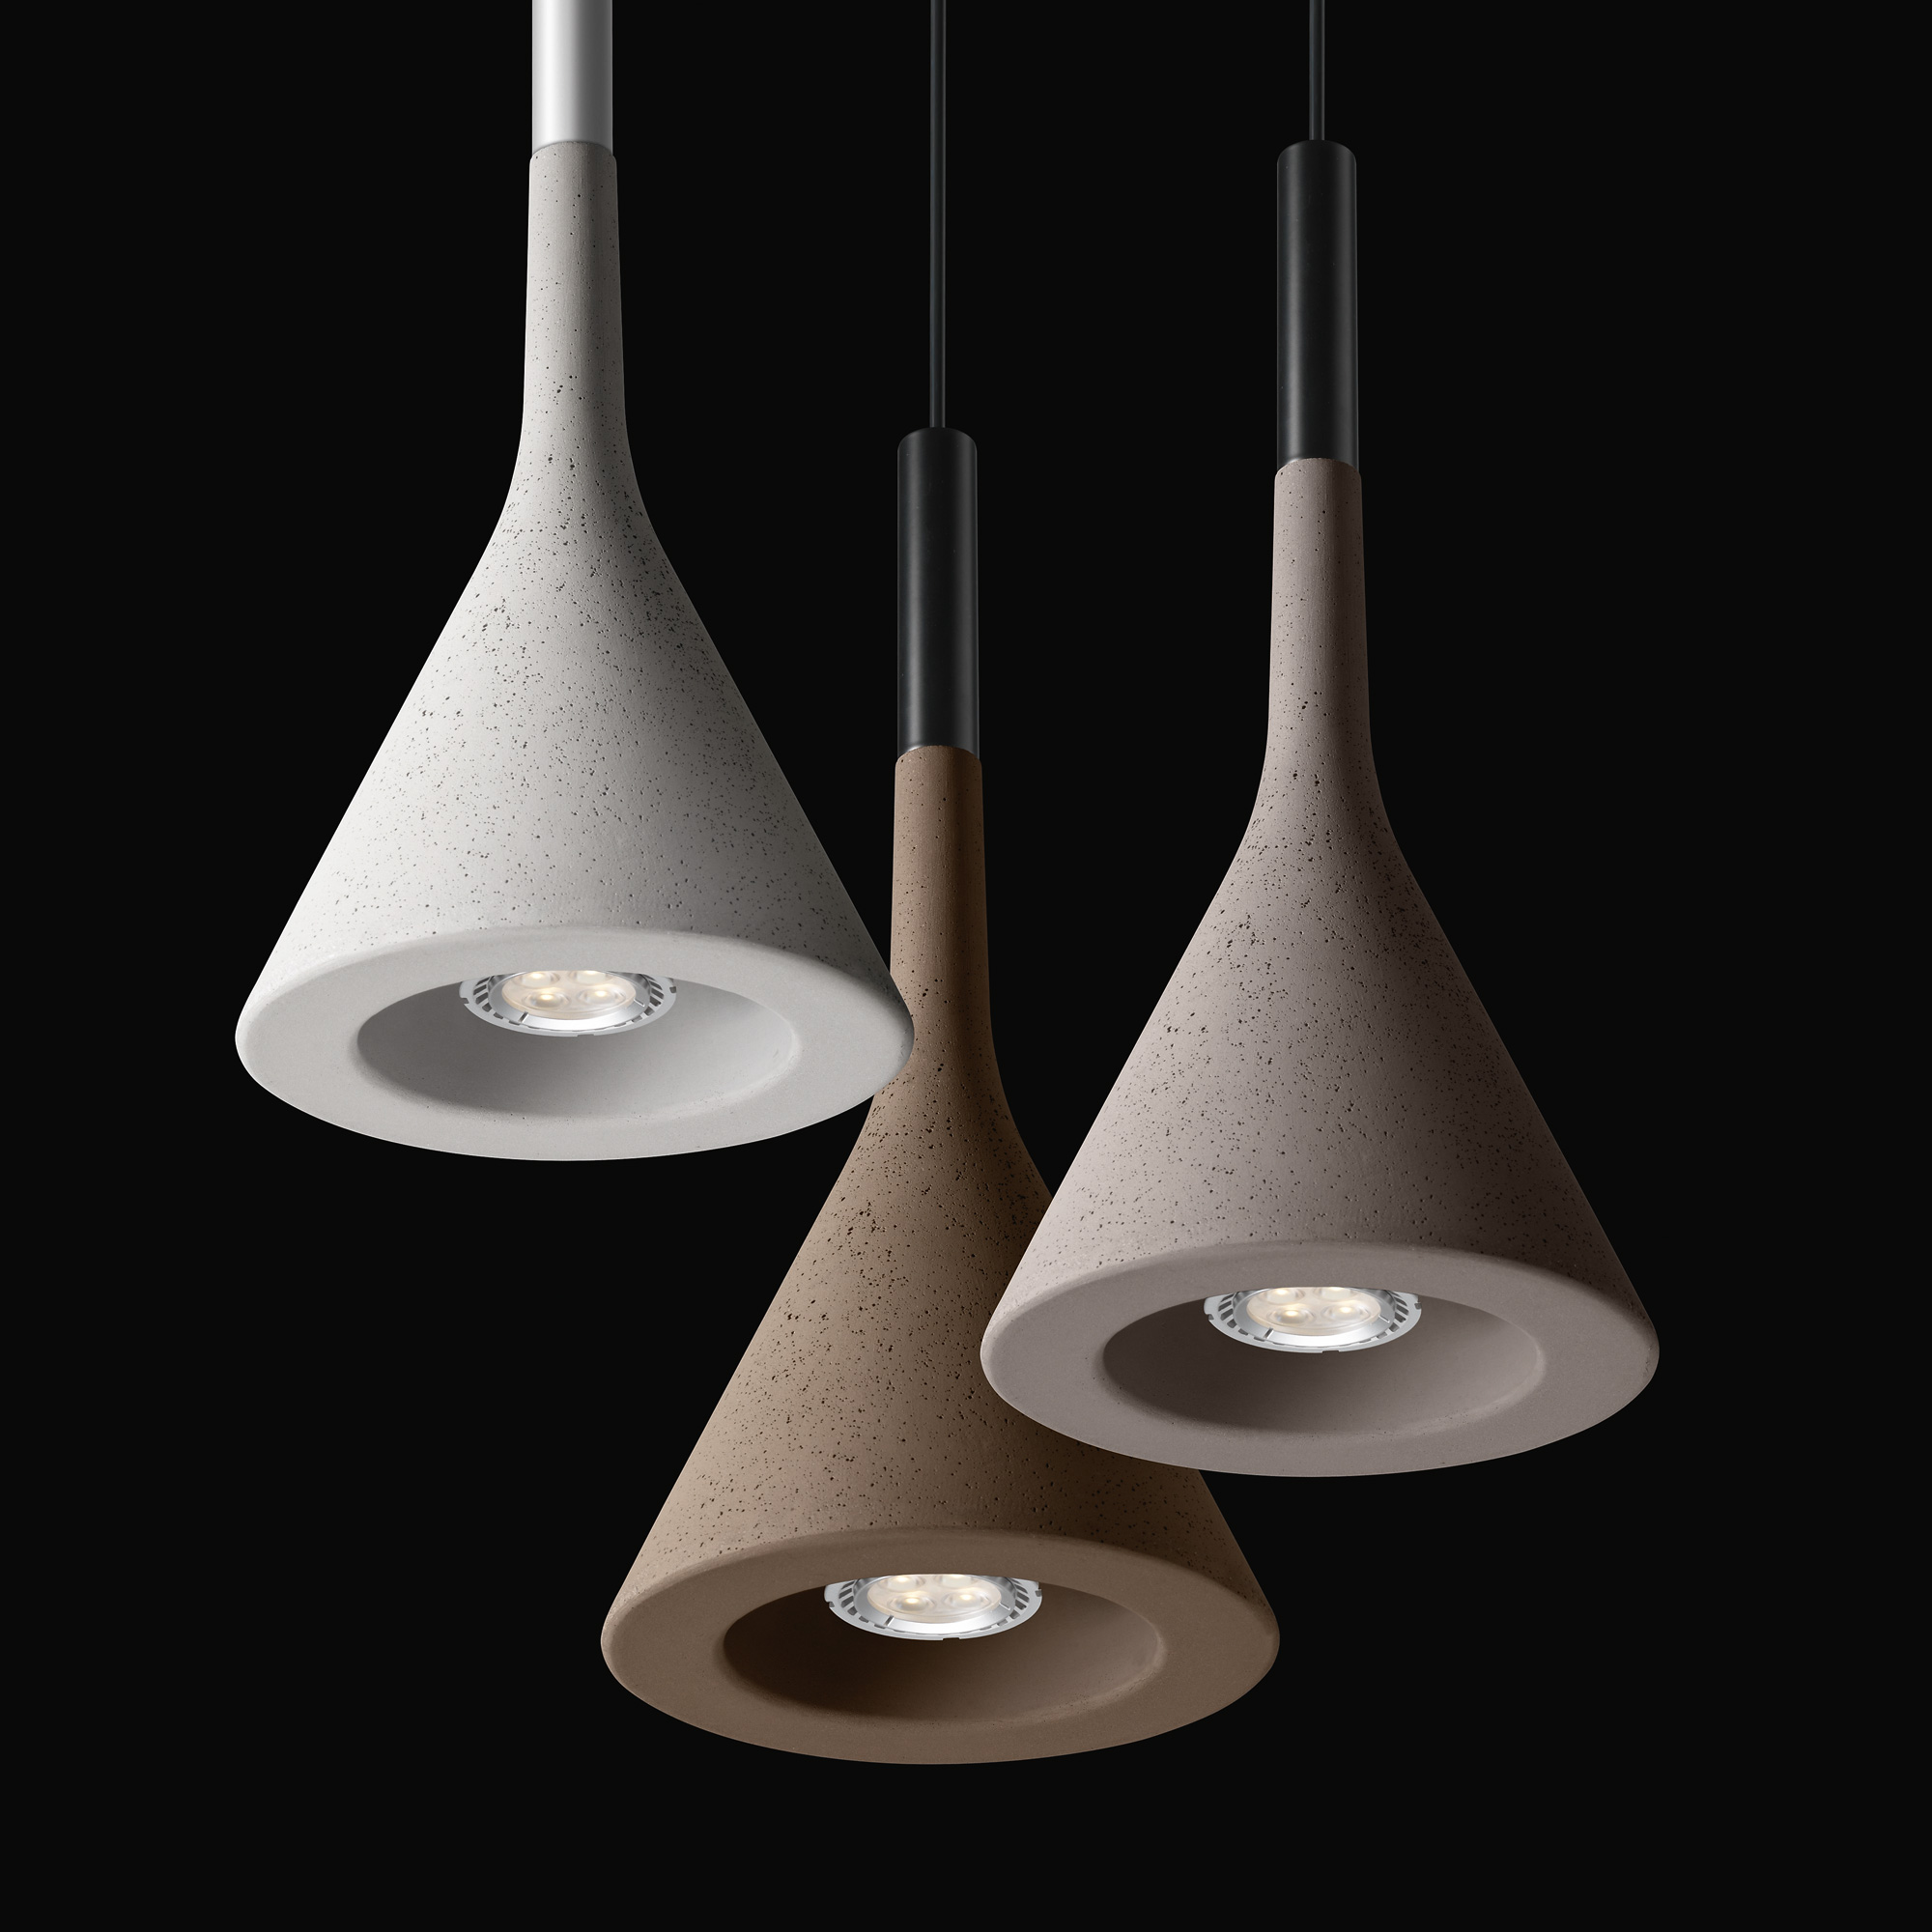 foscarini aplomb mini lamp pendant lamp white 195027sr 10. Black Bedroom Furniture Sets. Home Design Ideas